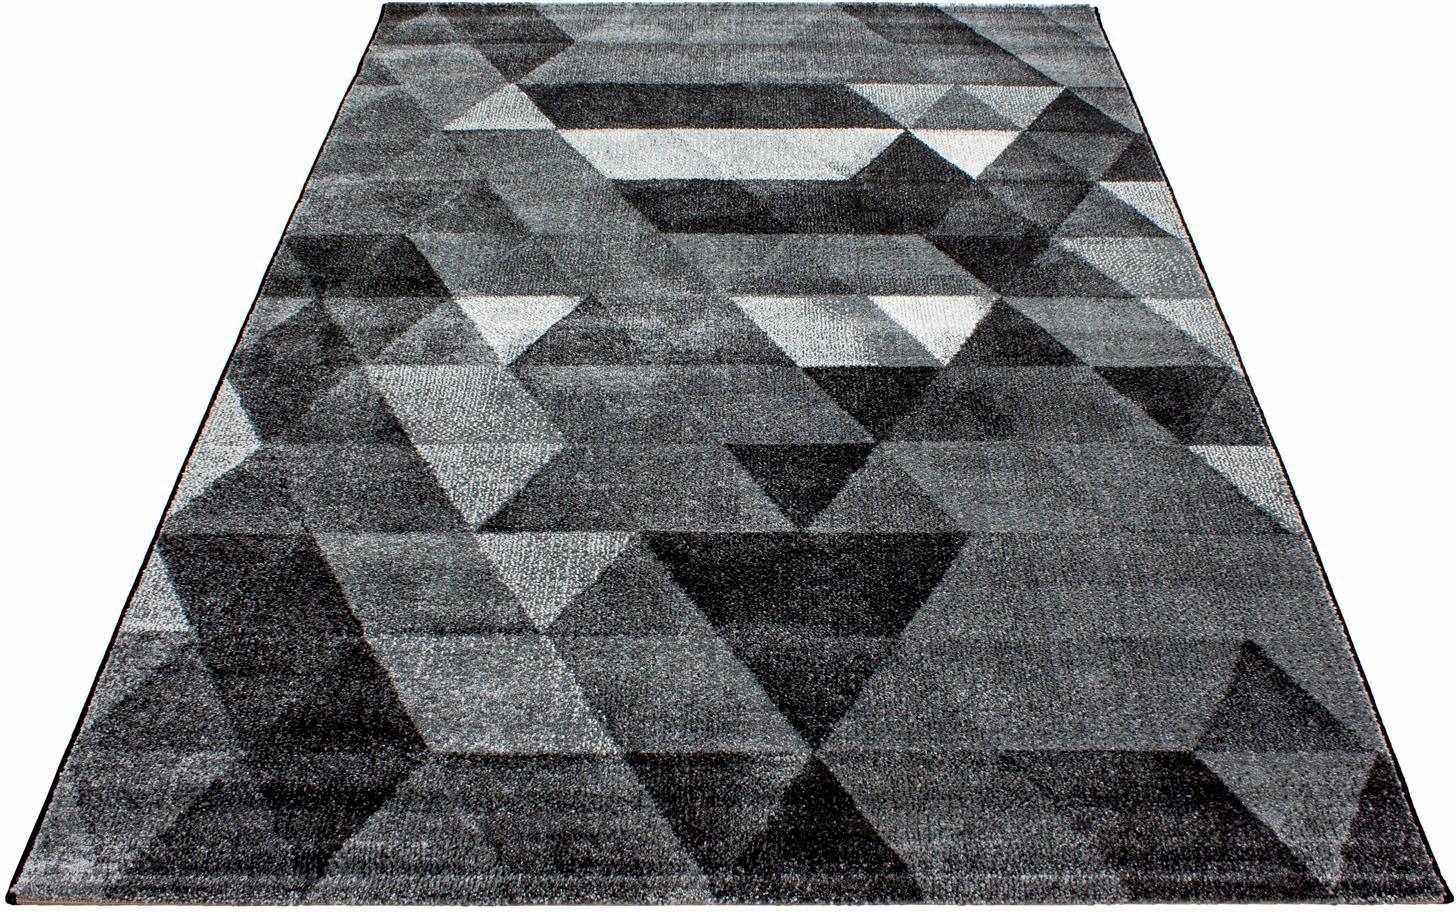 Teppich, »Lima 1920«, Ayyildiz Teppiche, rechteckig, Höhe 13 mm, maschinell gewebt   Heimtextilien > Teppiche > Sonstige-Teppiche   Schwarz   AYYILDIZ TEPPICHE